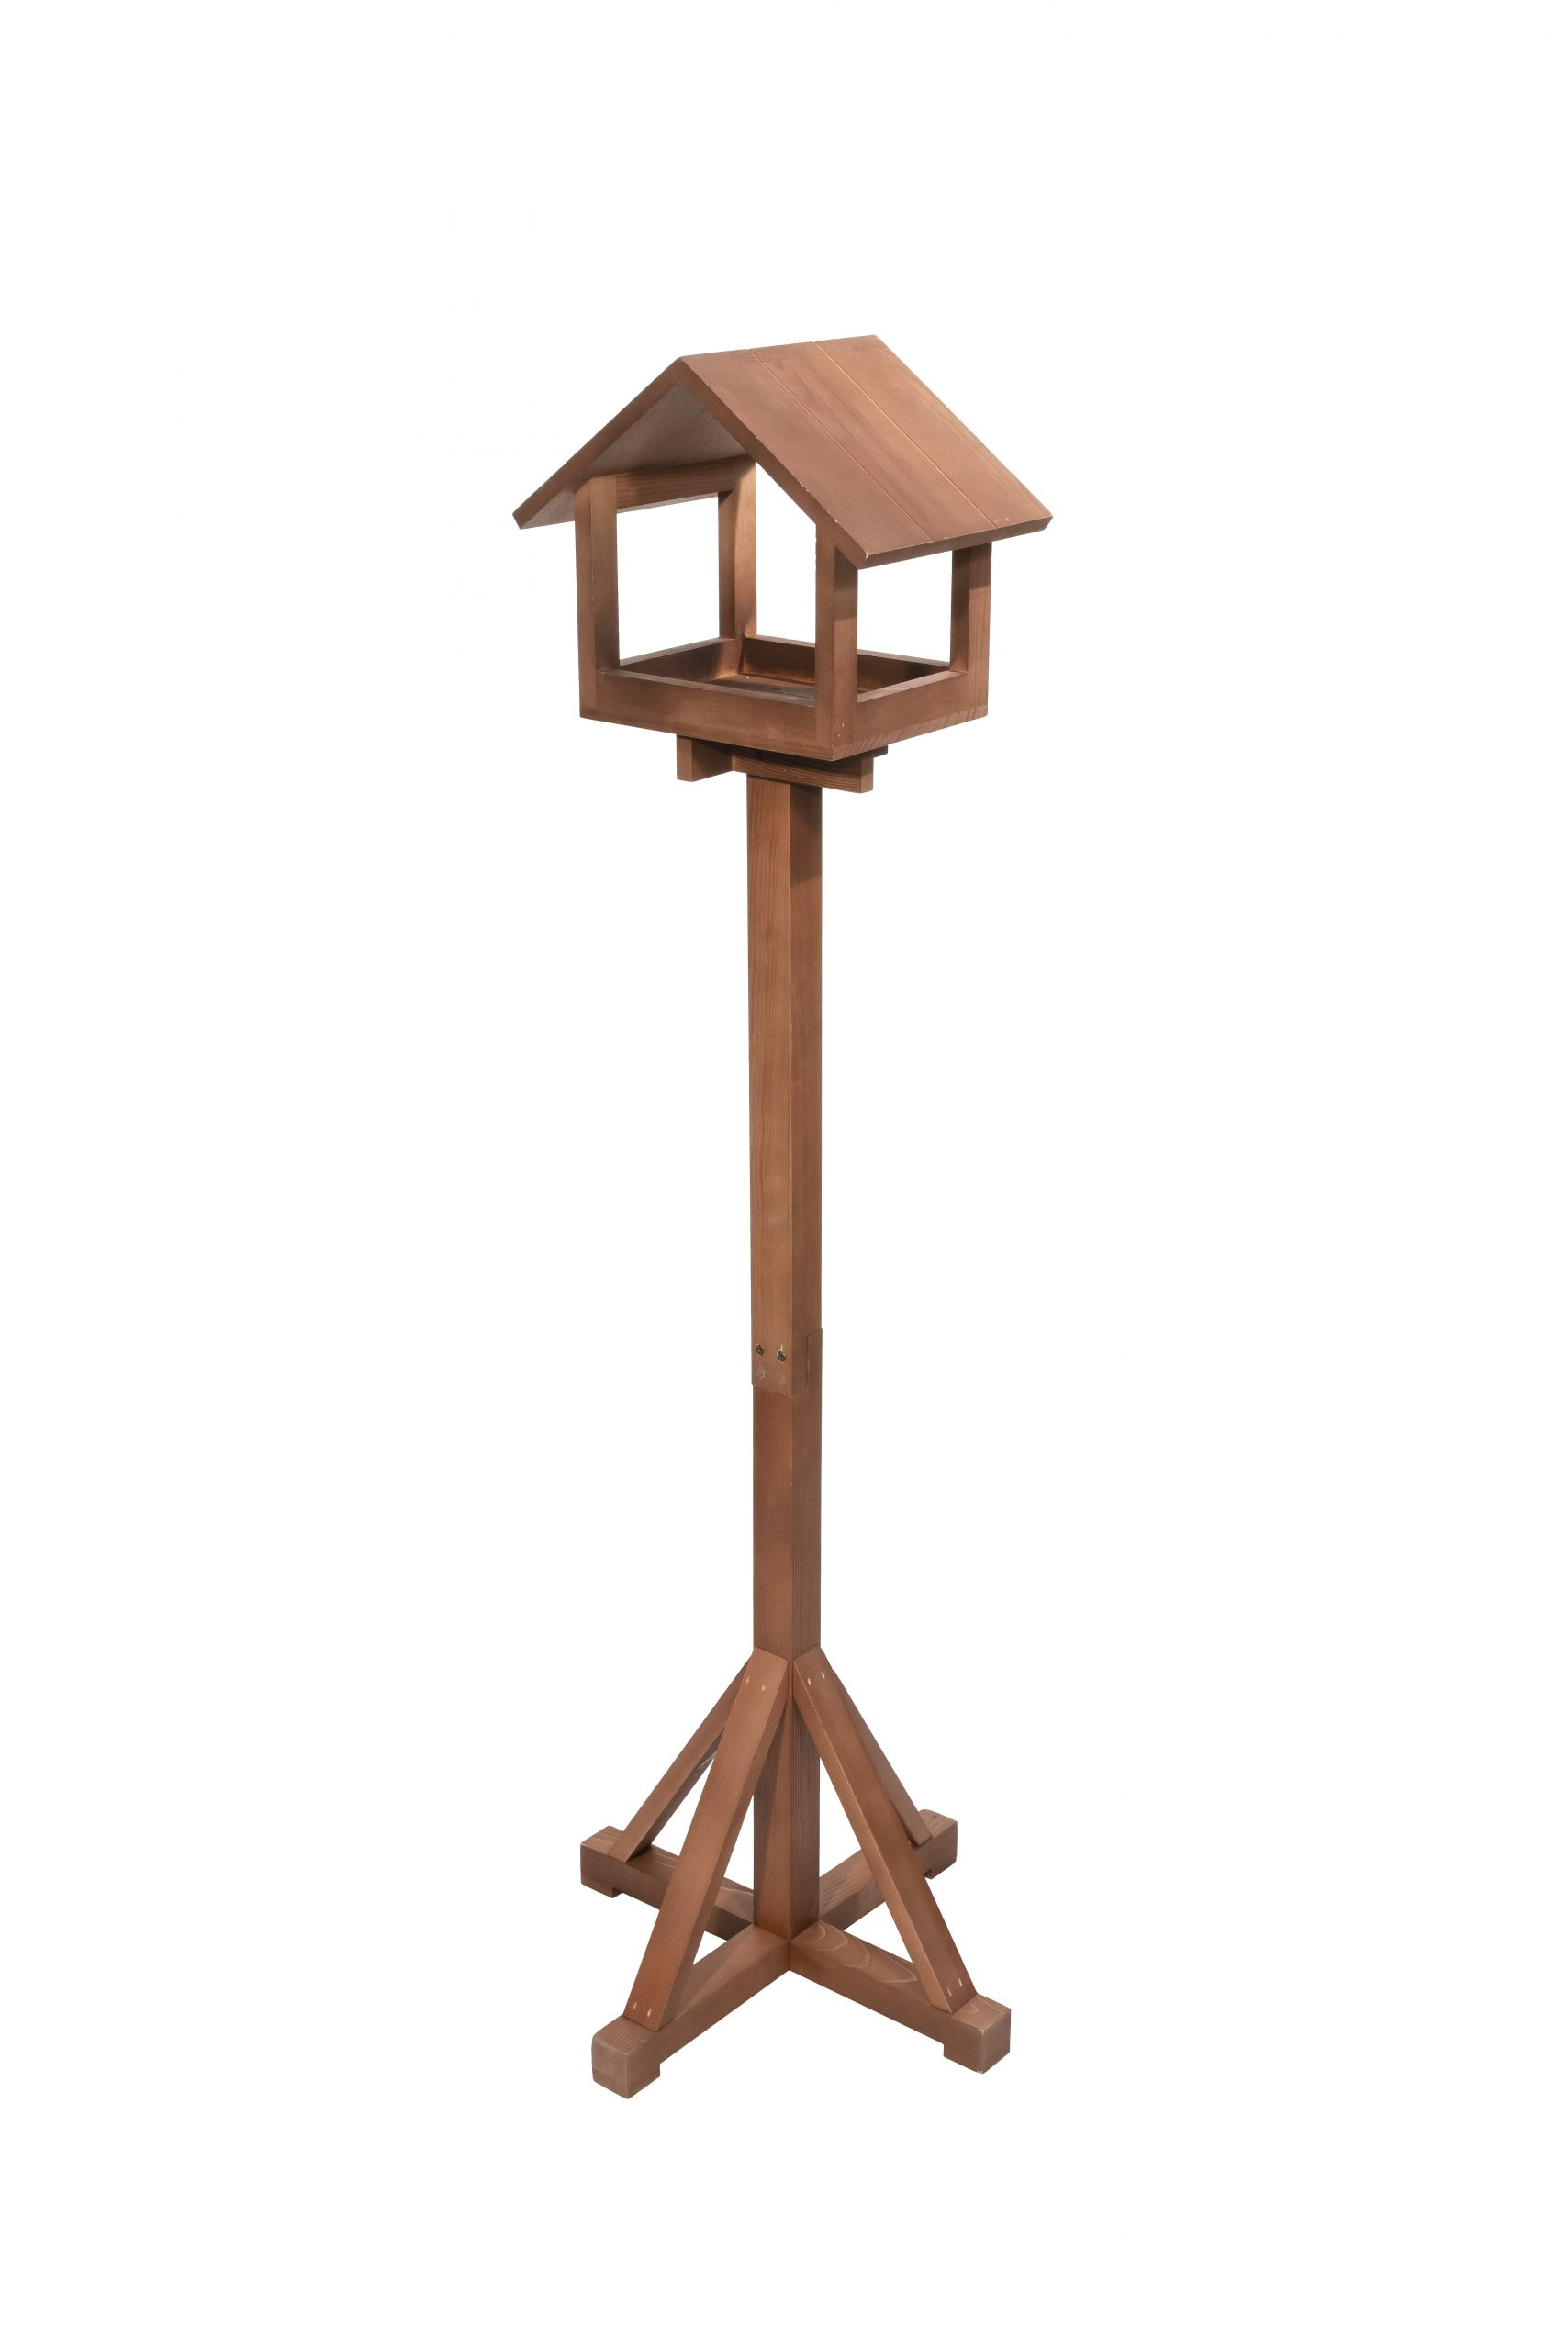 The Lincoln Bird Table